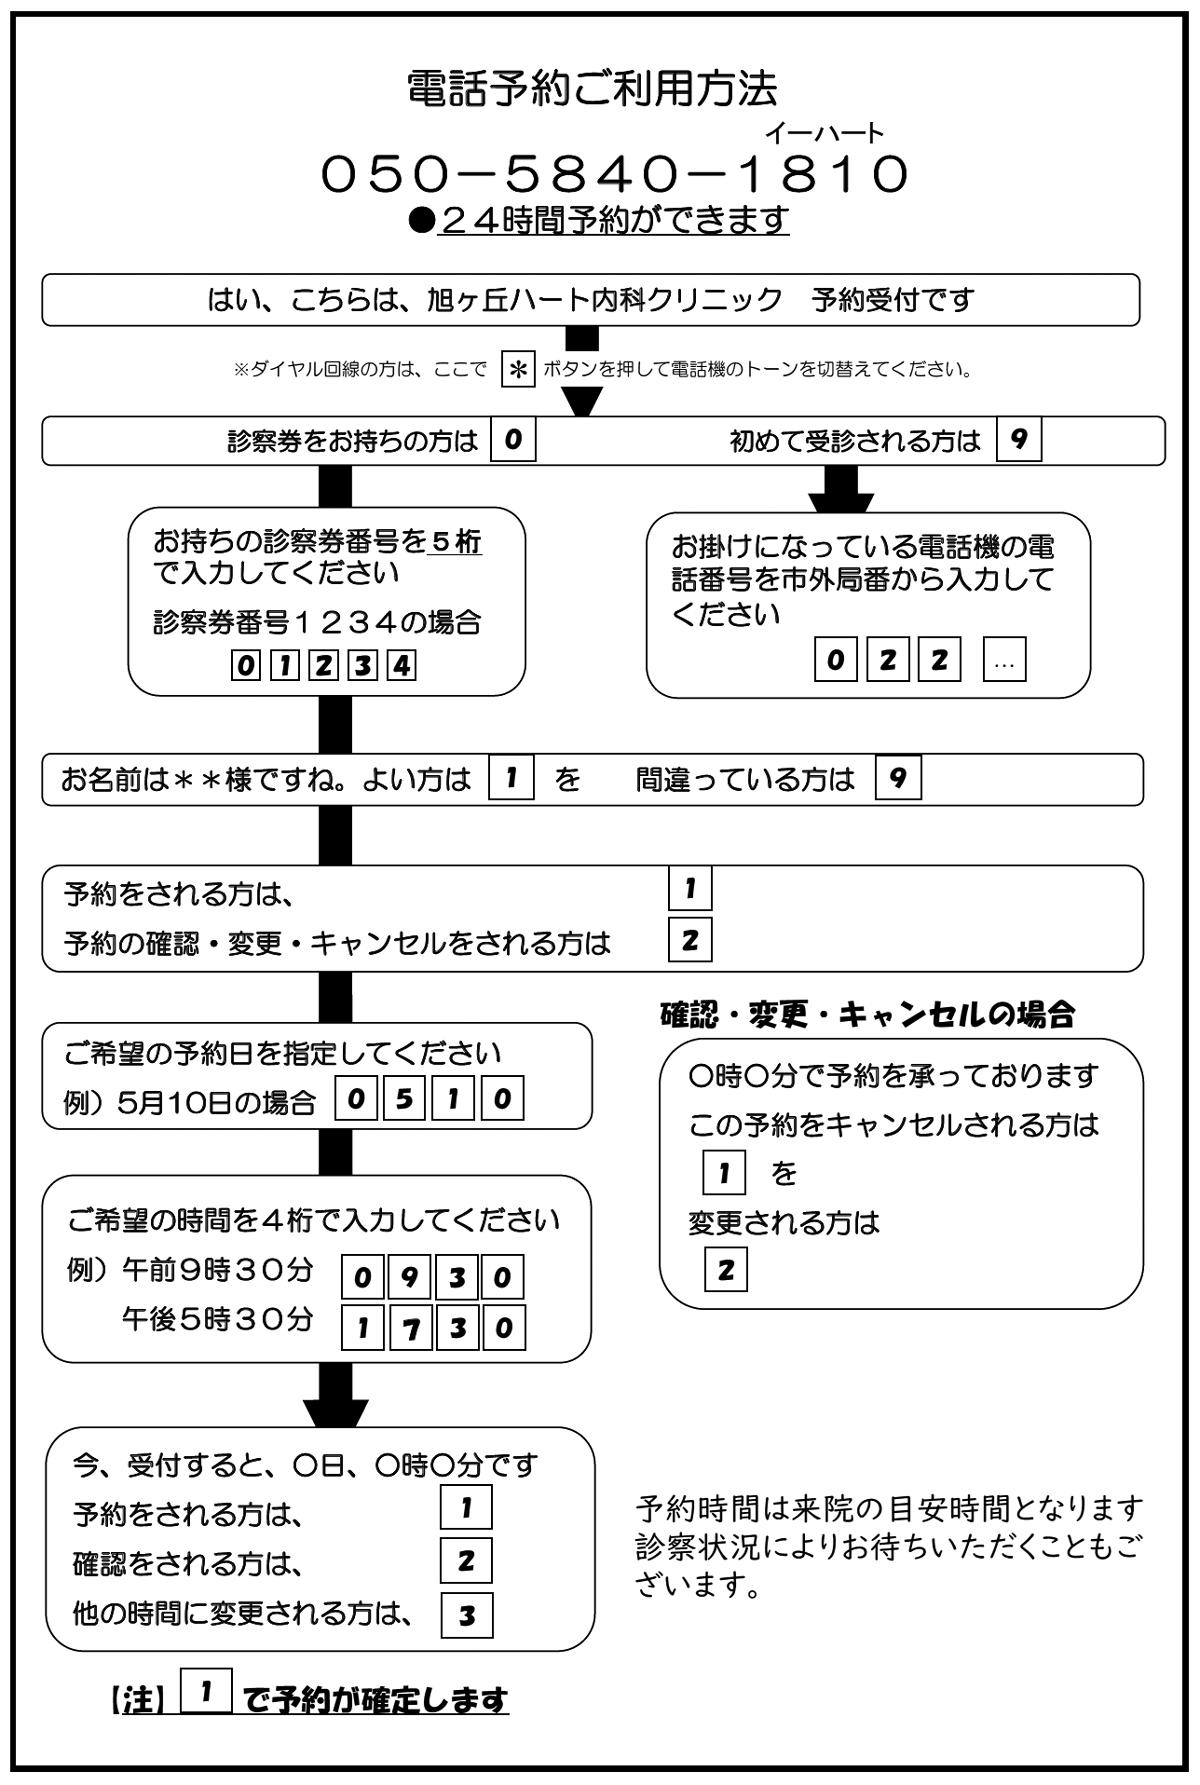 旭ヶ丘ハート内科予約方法2